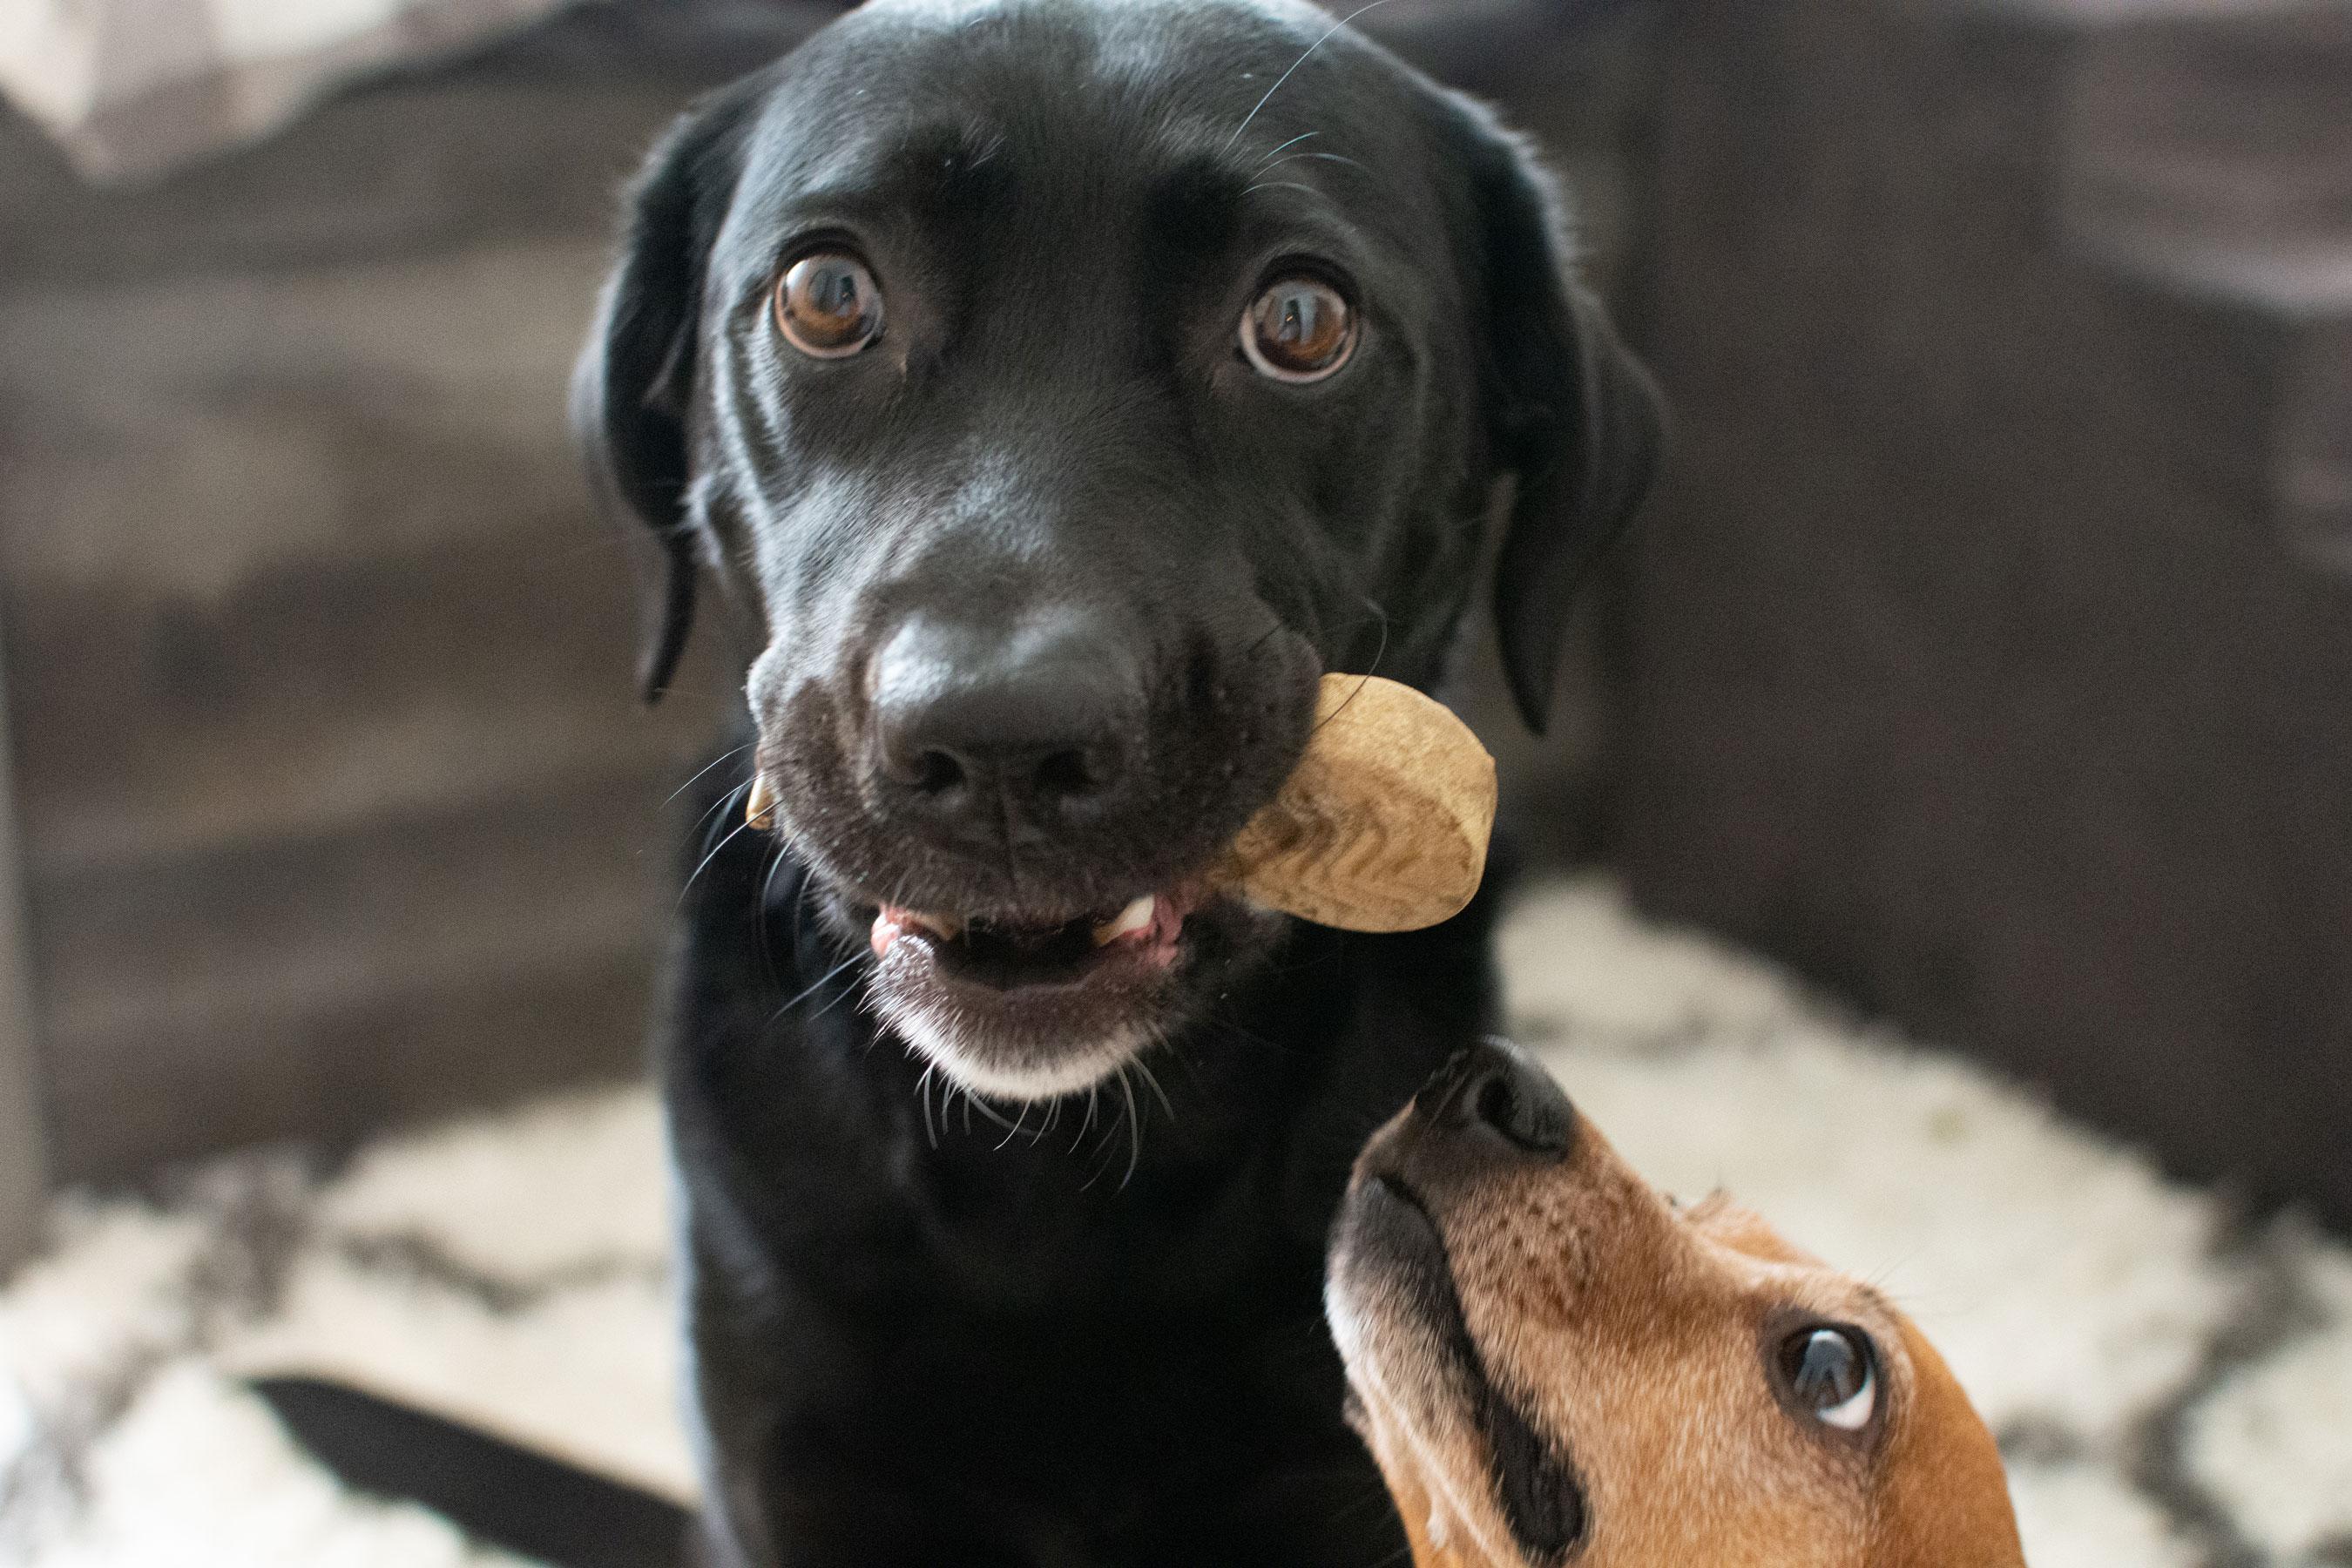 Saylor the Labrador enjoying her Redbarn Chew-A-Bulls brush.